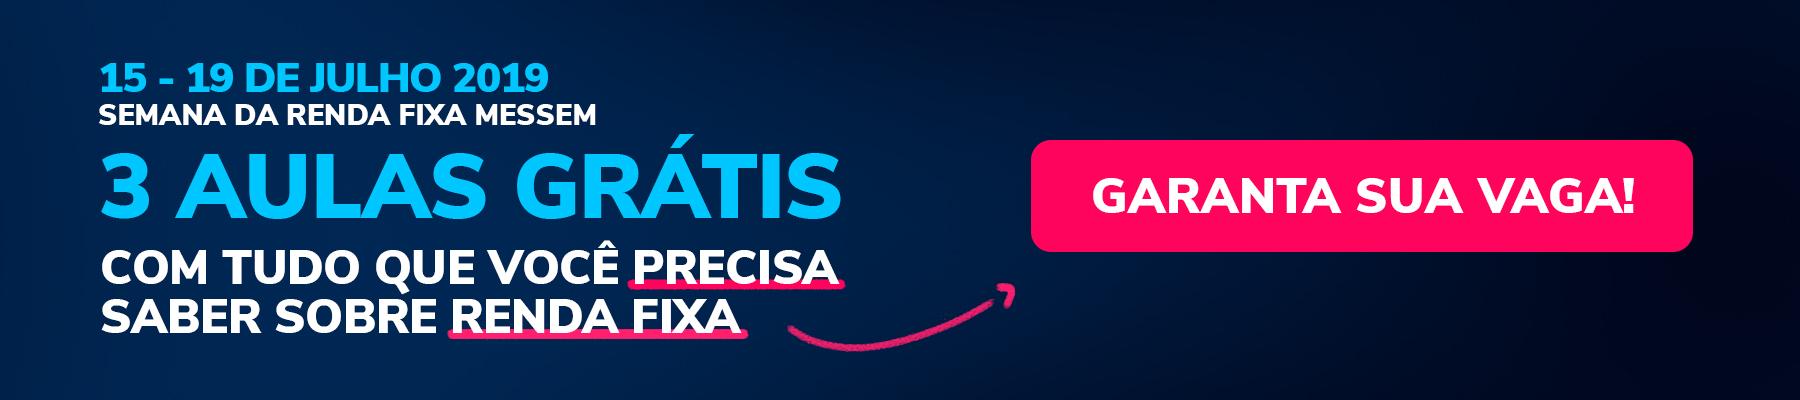 banner-blog-campanha-rf.jpg